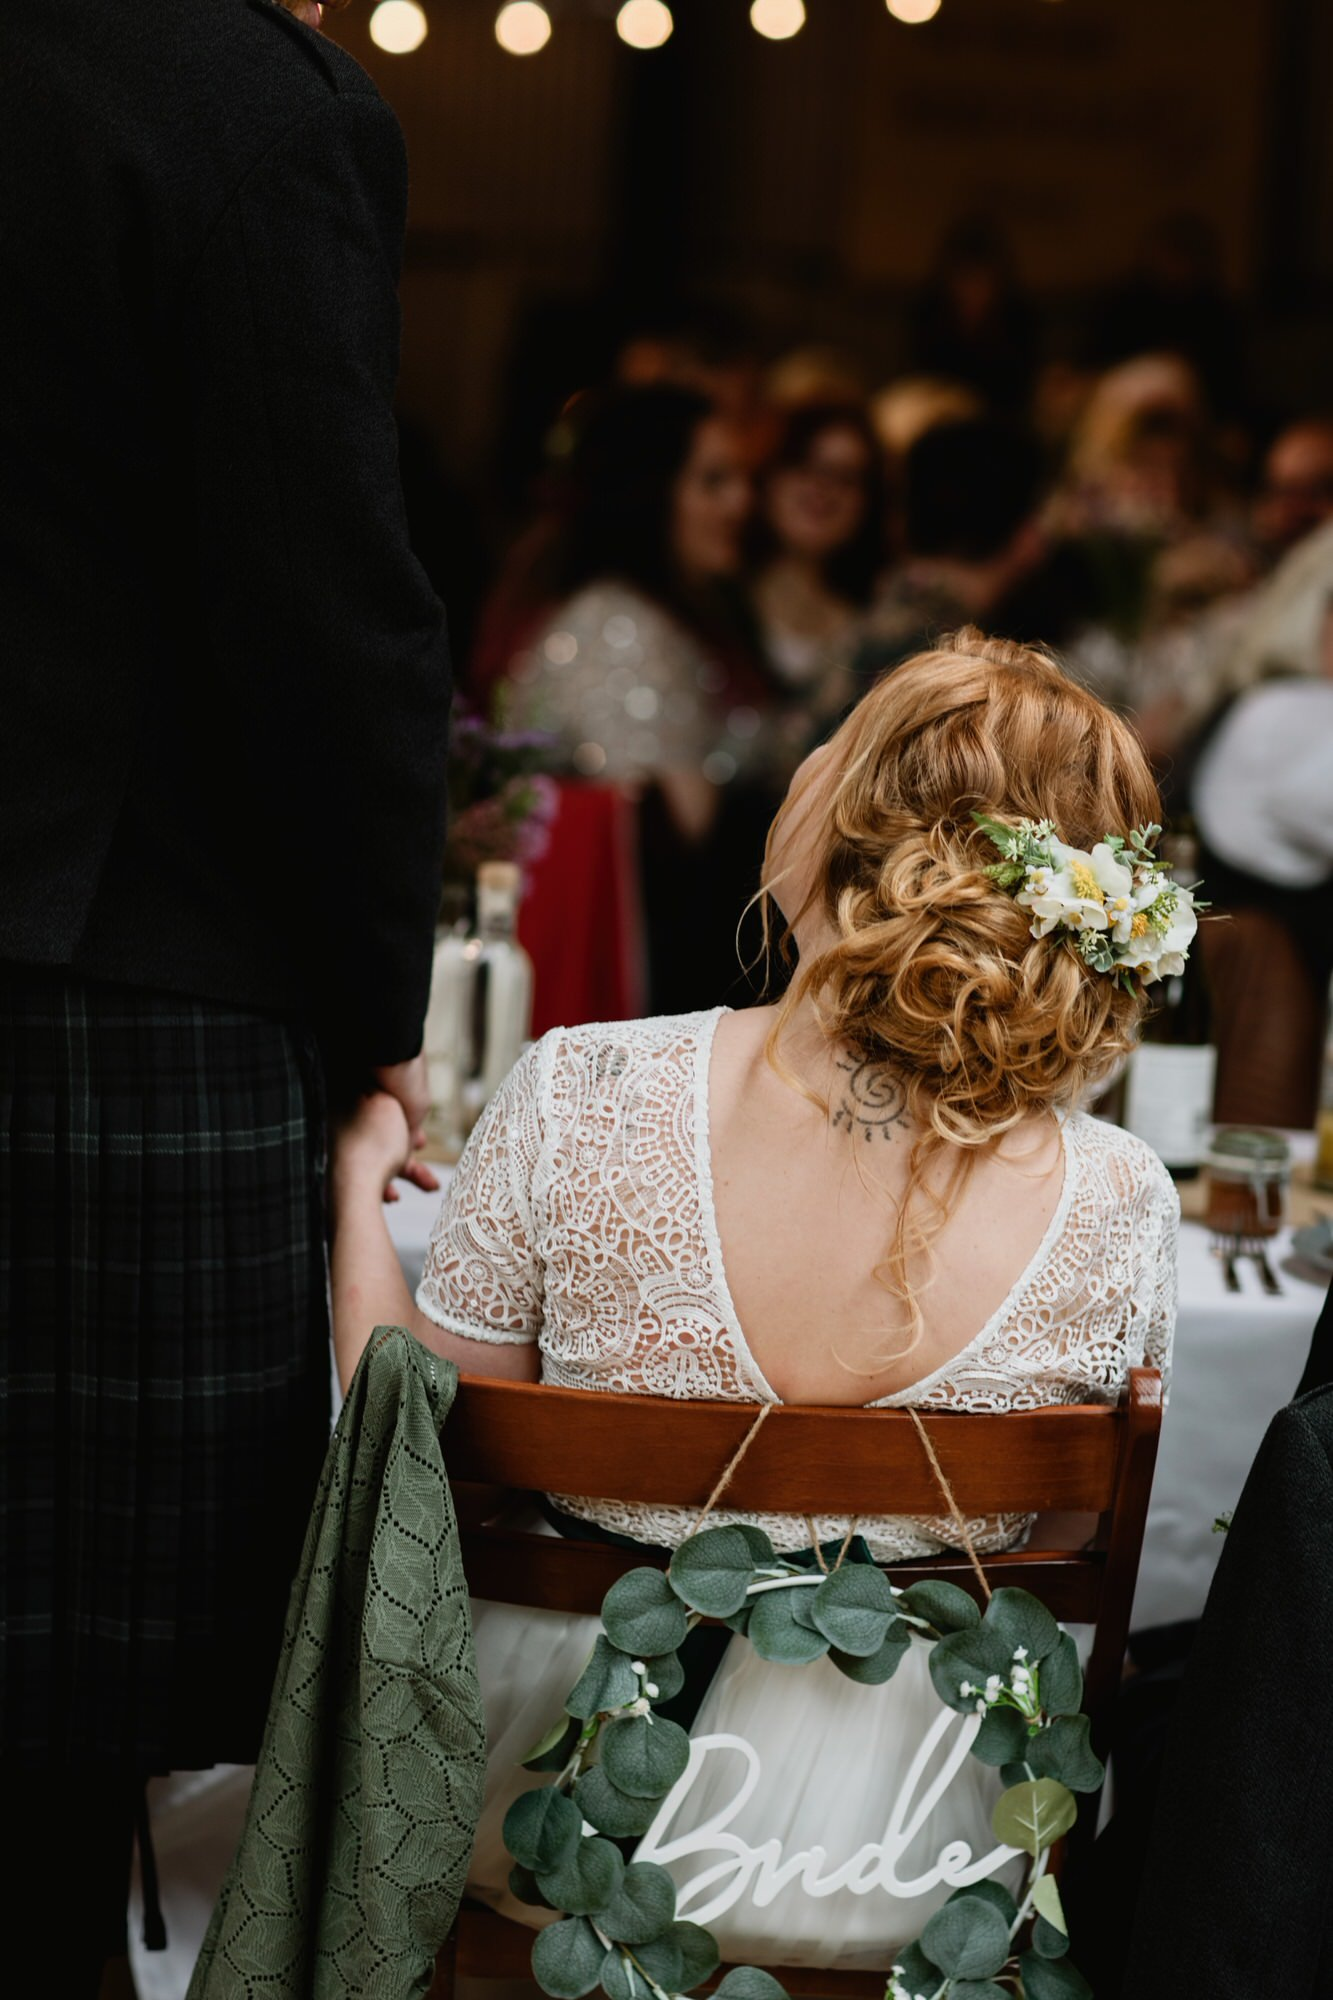 046 TIN SHED KNOCKRAICH WEDDING AUSTRIAN SCOTTISH ZOE ALEXANDRA PHOTOGRAPHY